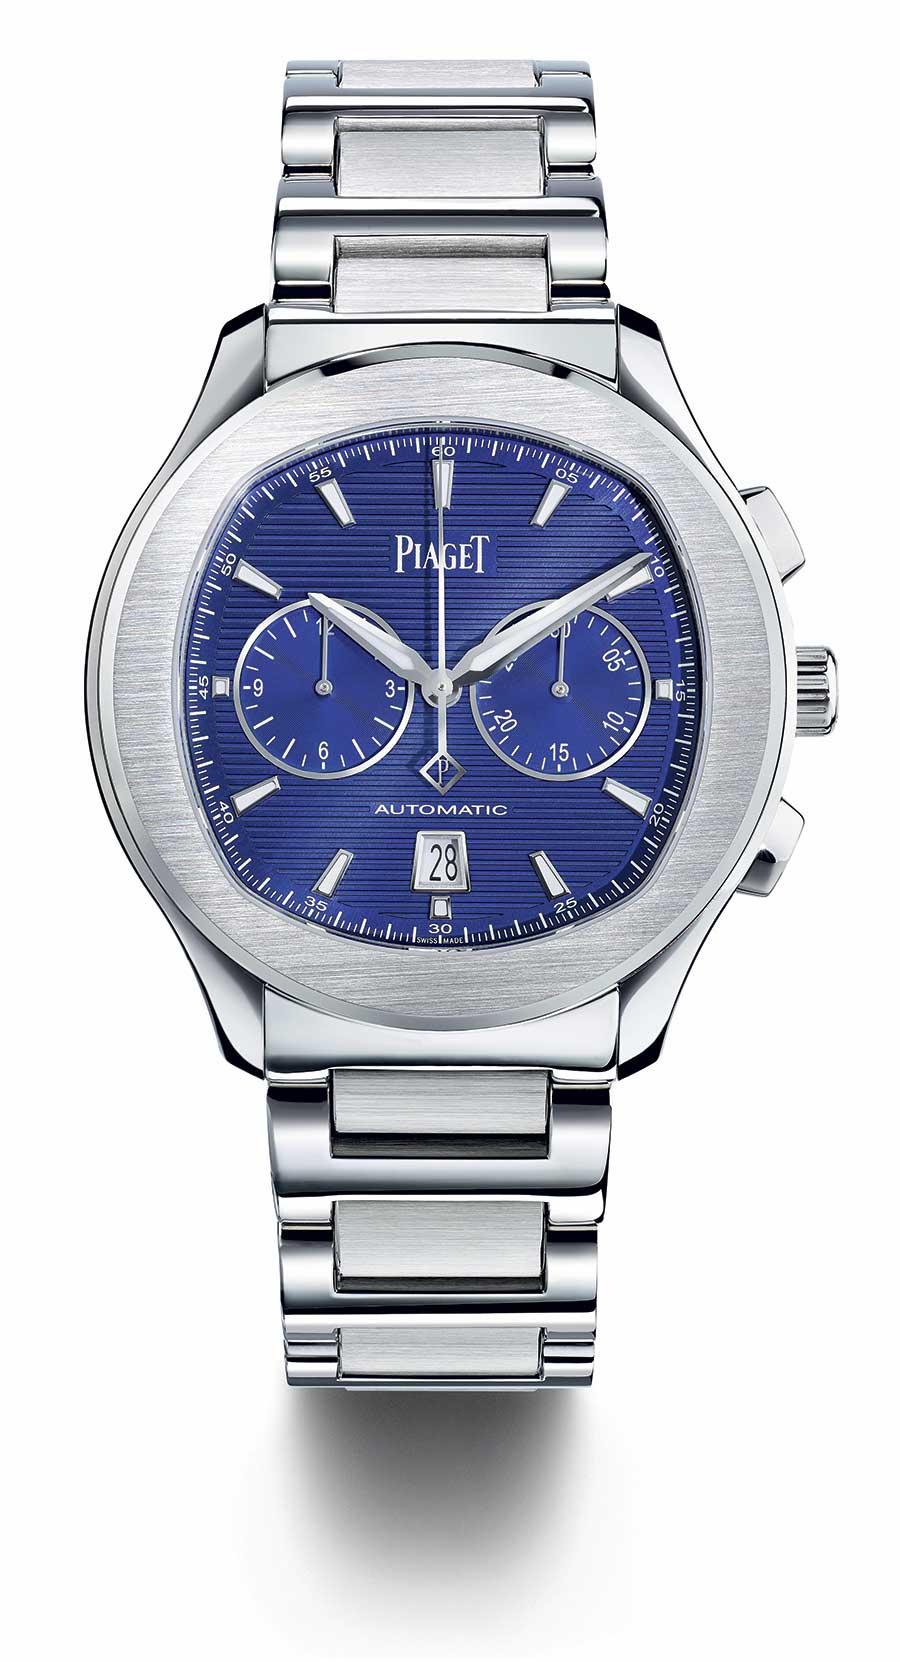 Piaget Polo S cronografo quadrante blu